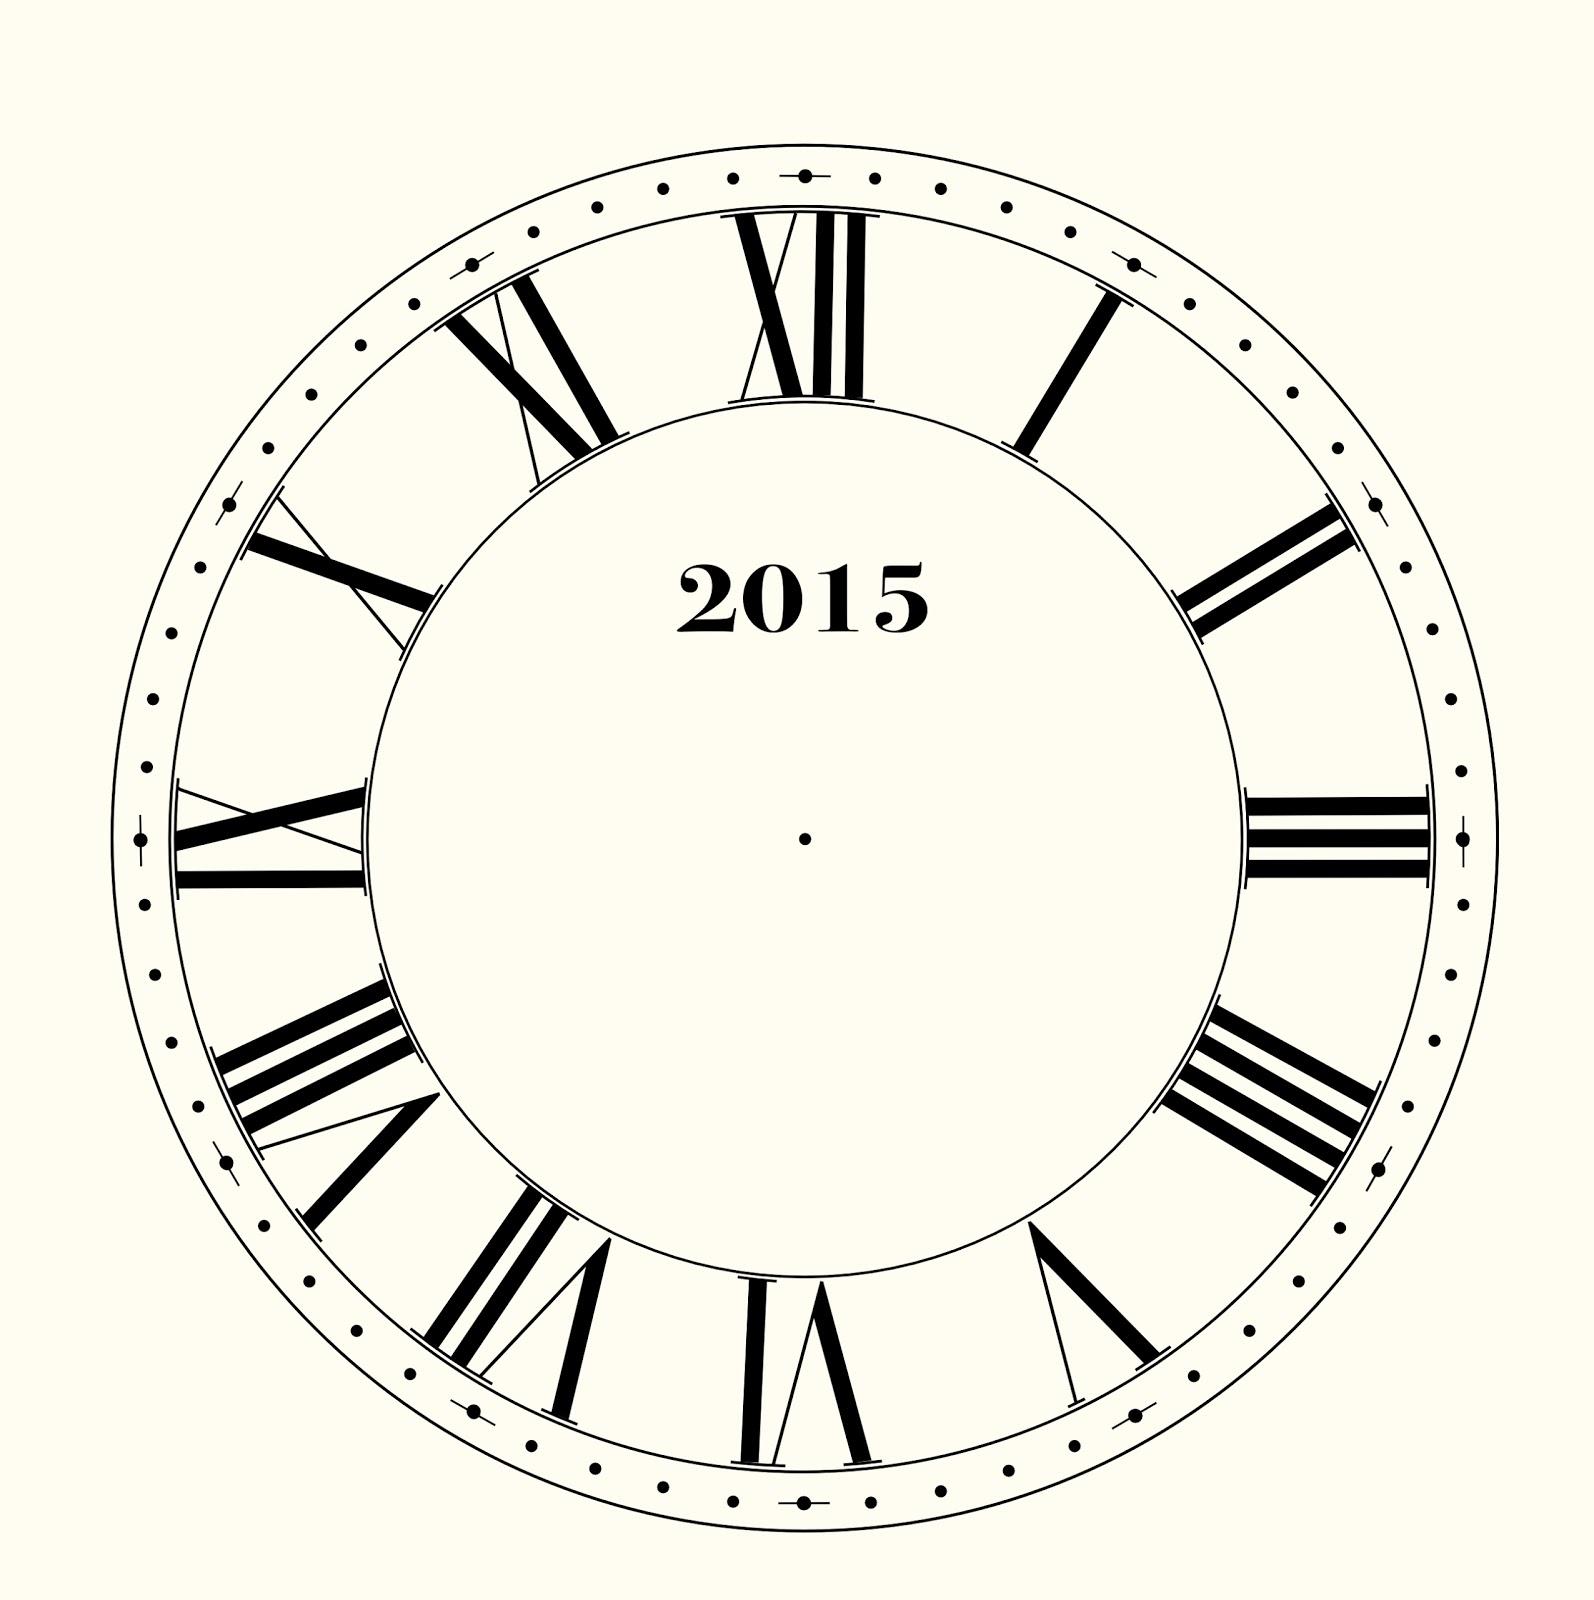 1594x1600 The Urban Yeoman Isaac Newton Young's Shaker Wall Clock Face